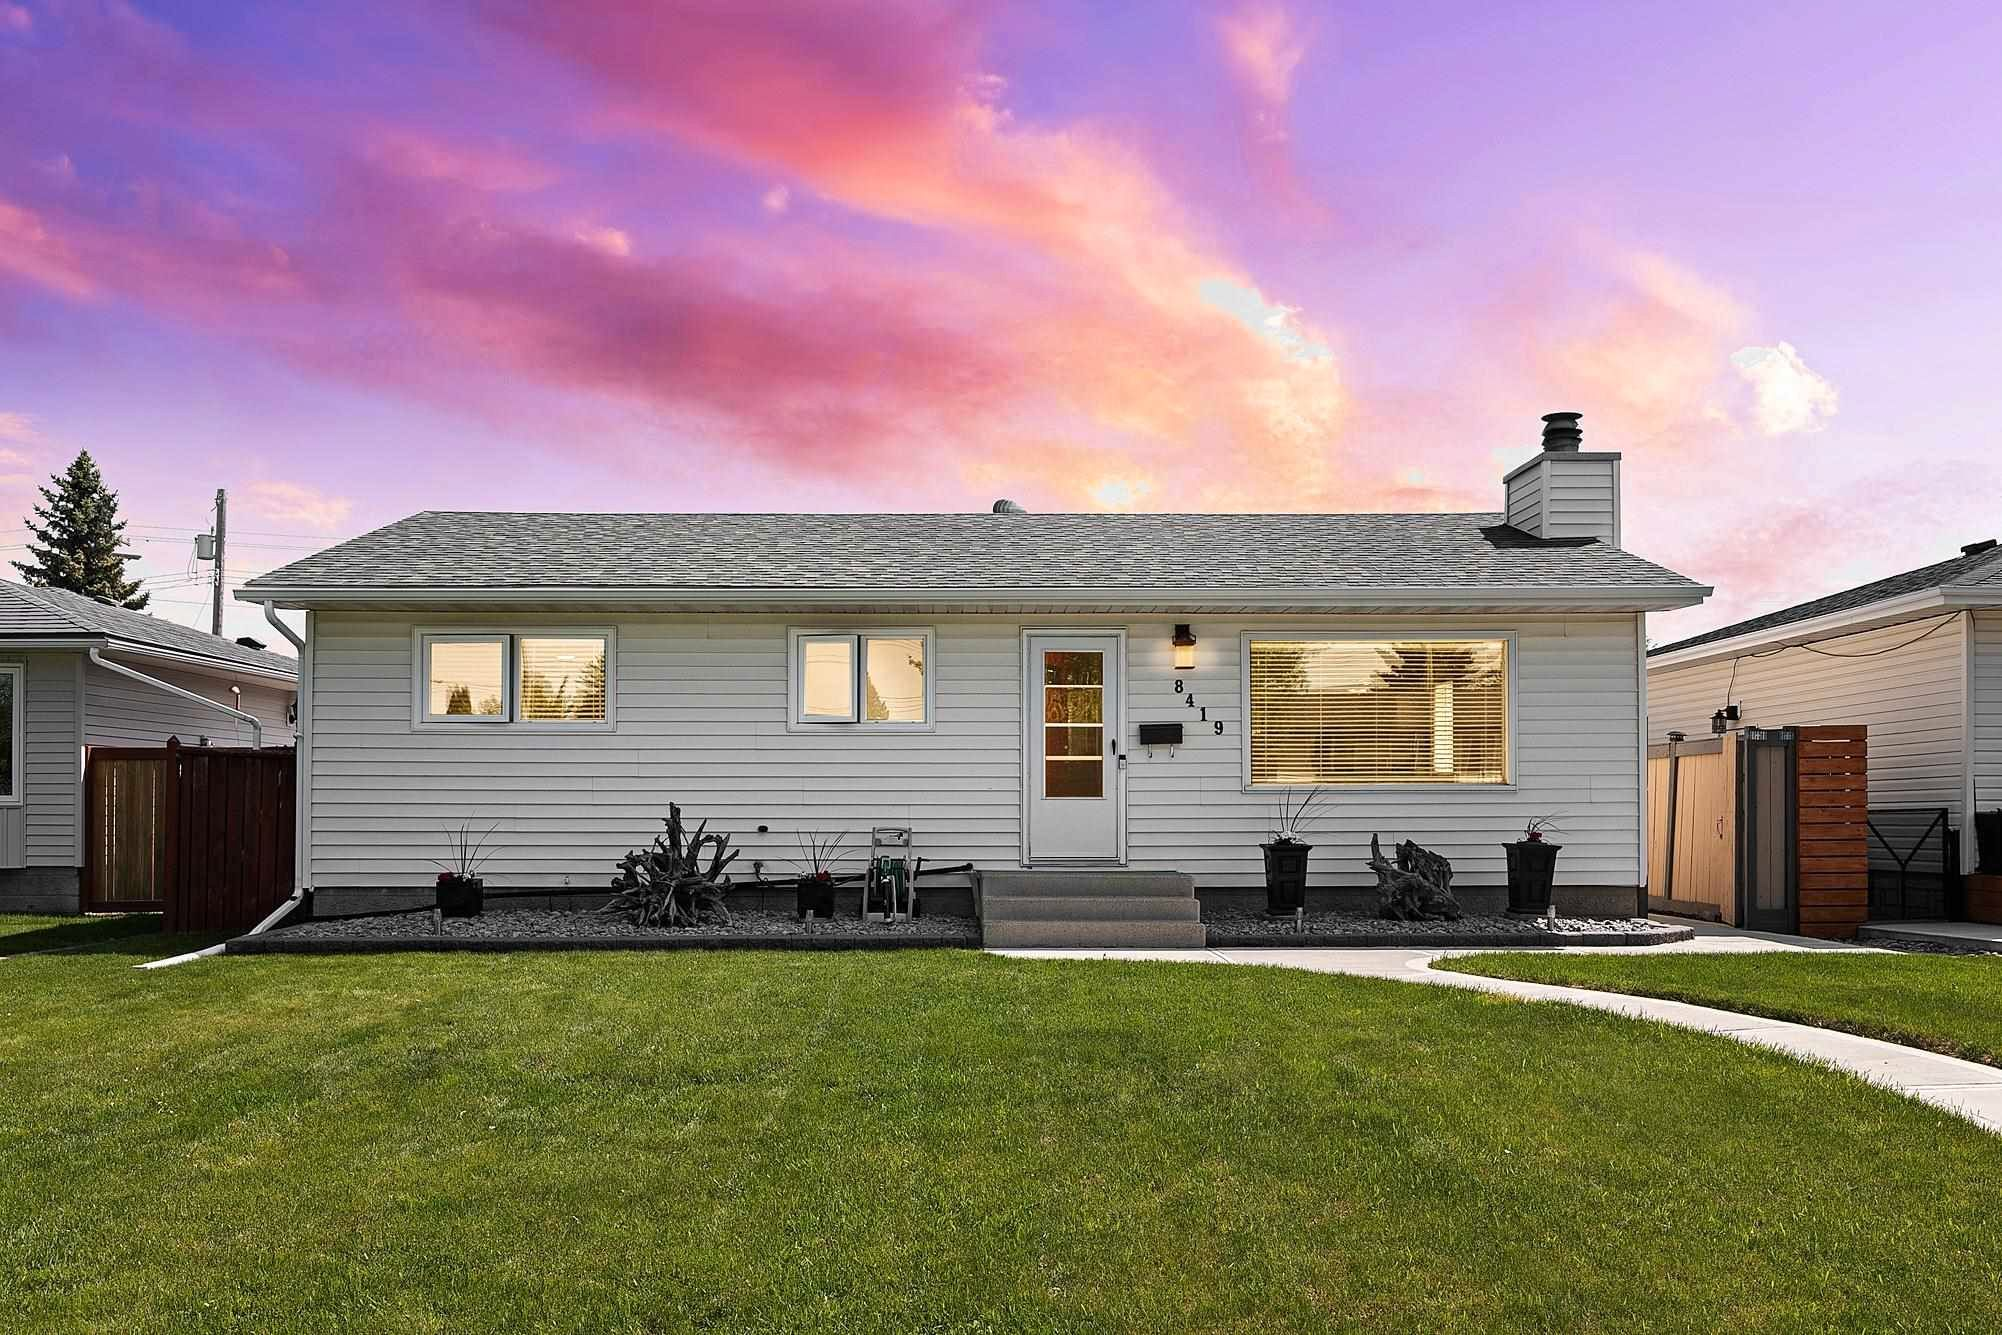 Main Photo: 8419 52 Street in Edmonton: Zone 18 House for sale : MLS®# E4246813